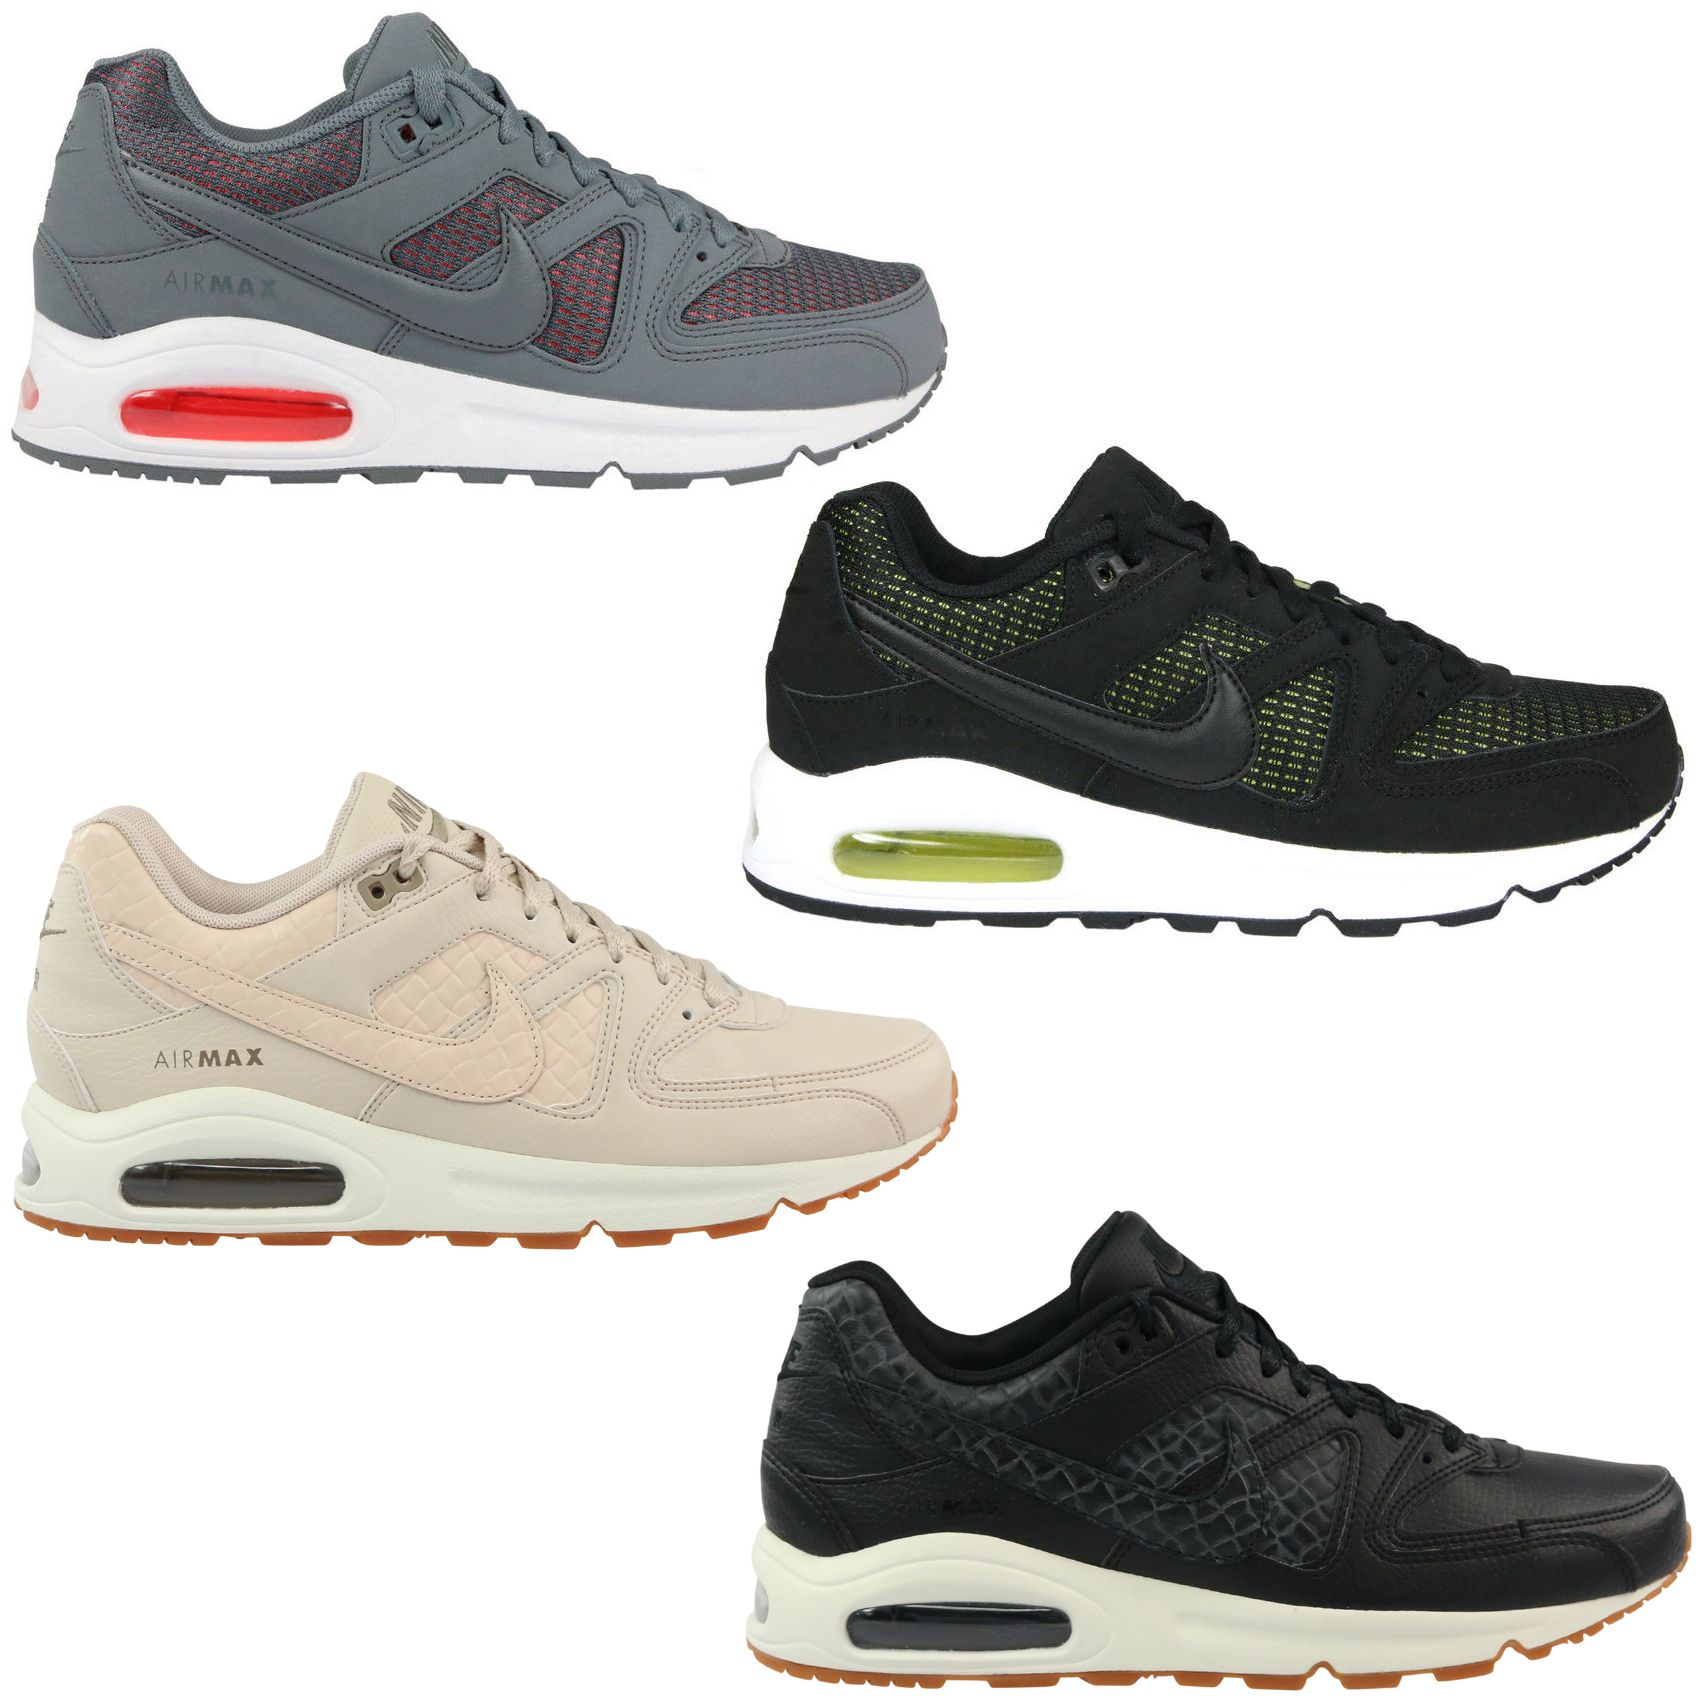 nike wmns air max command schuhe sneaker turnschuhe damen schwarz ebay. Black Bedroom Furniture Sets. Home Design Ideas